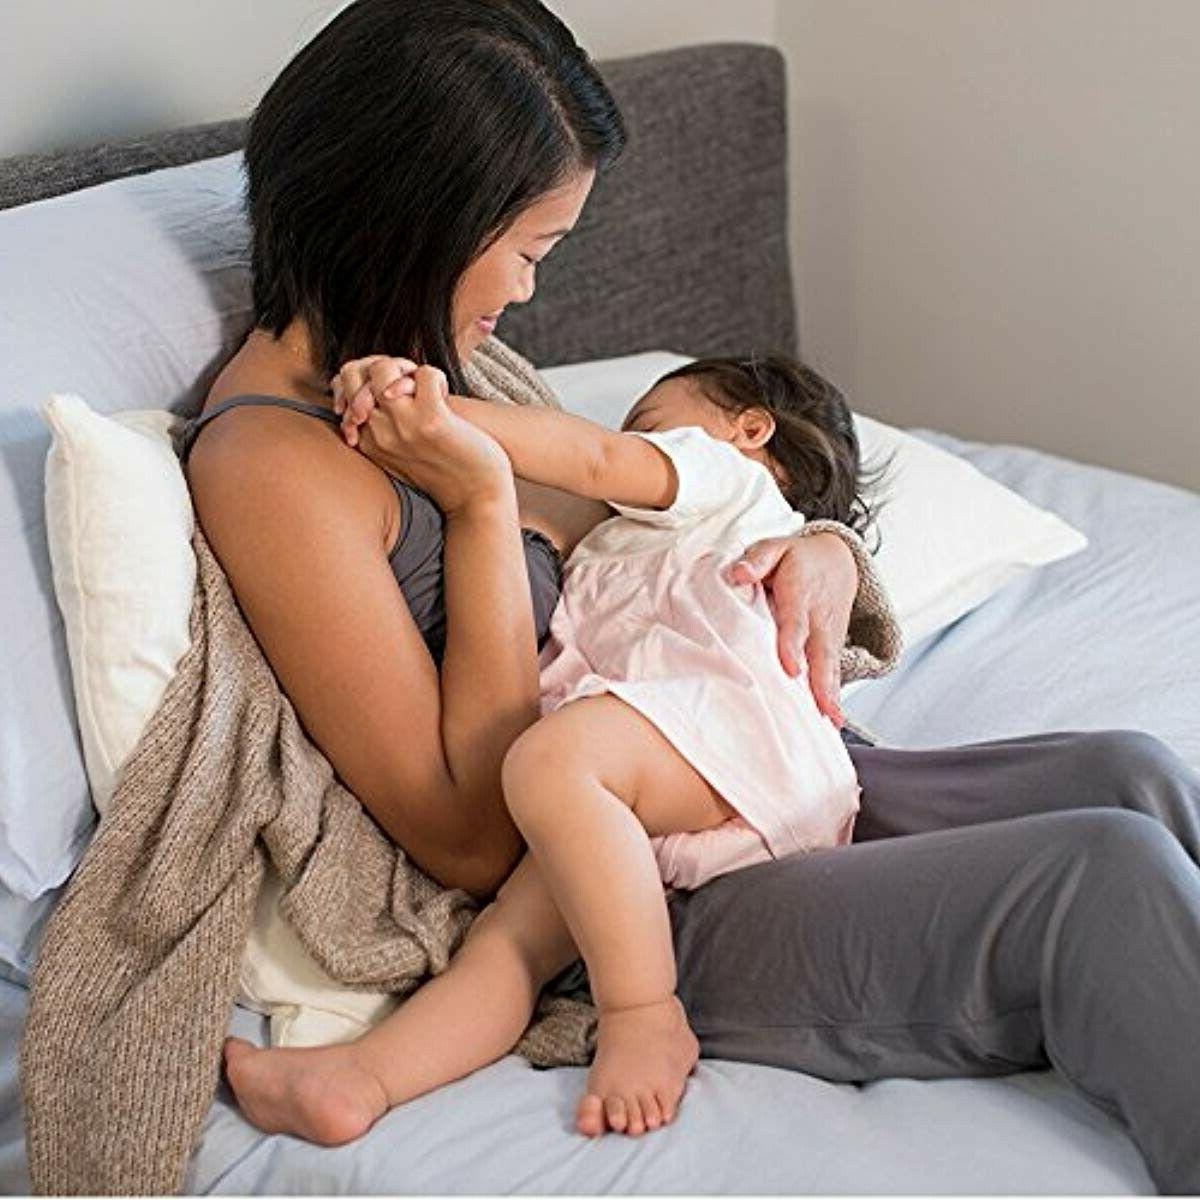 Lansinoh Dry Disposable Breast